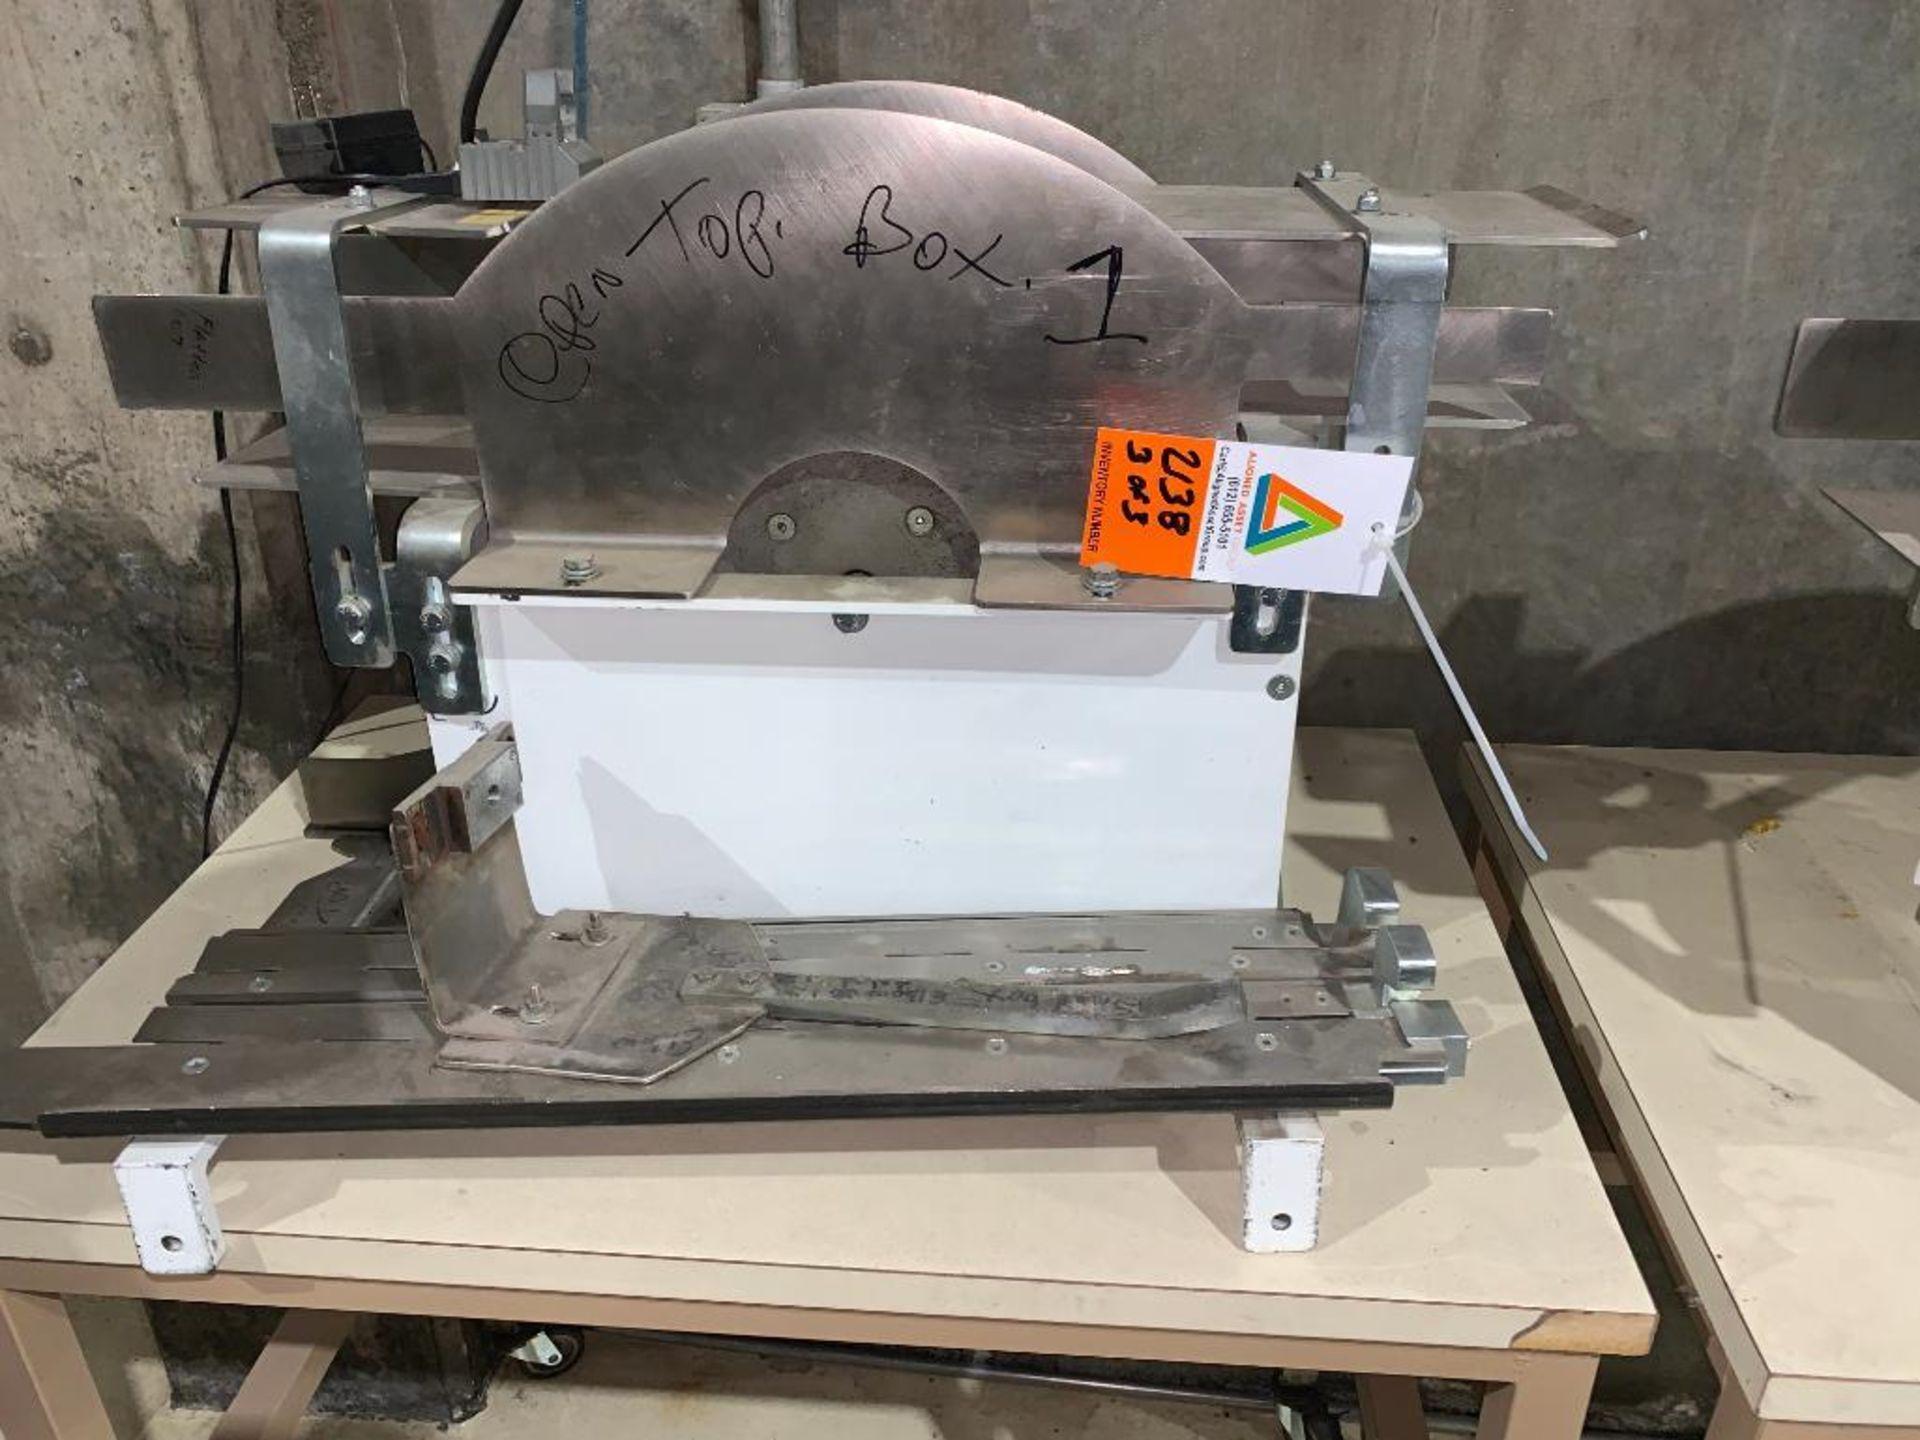 mild steel belt conveyor, 68 in. x 10 in., with box conditioner - Image 11 of 13